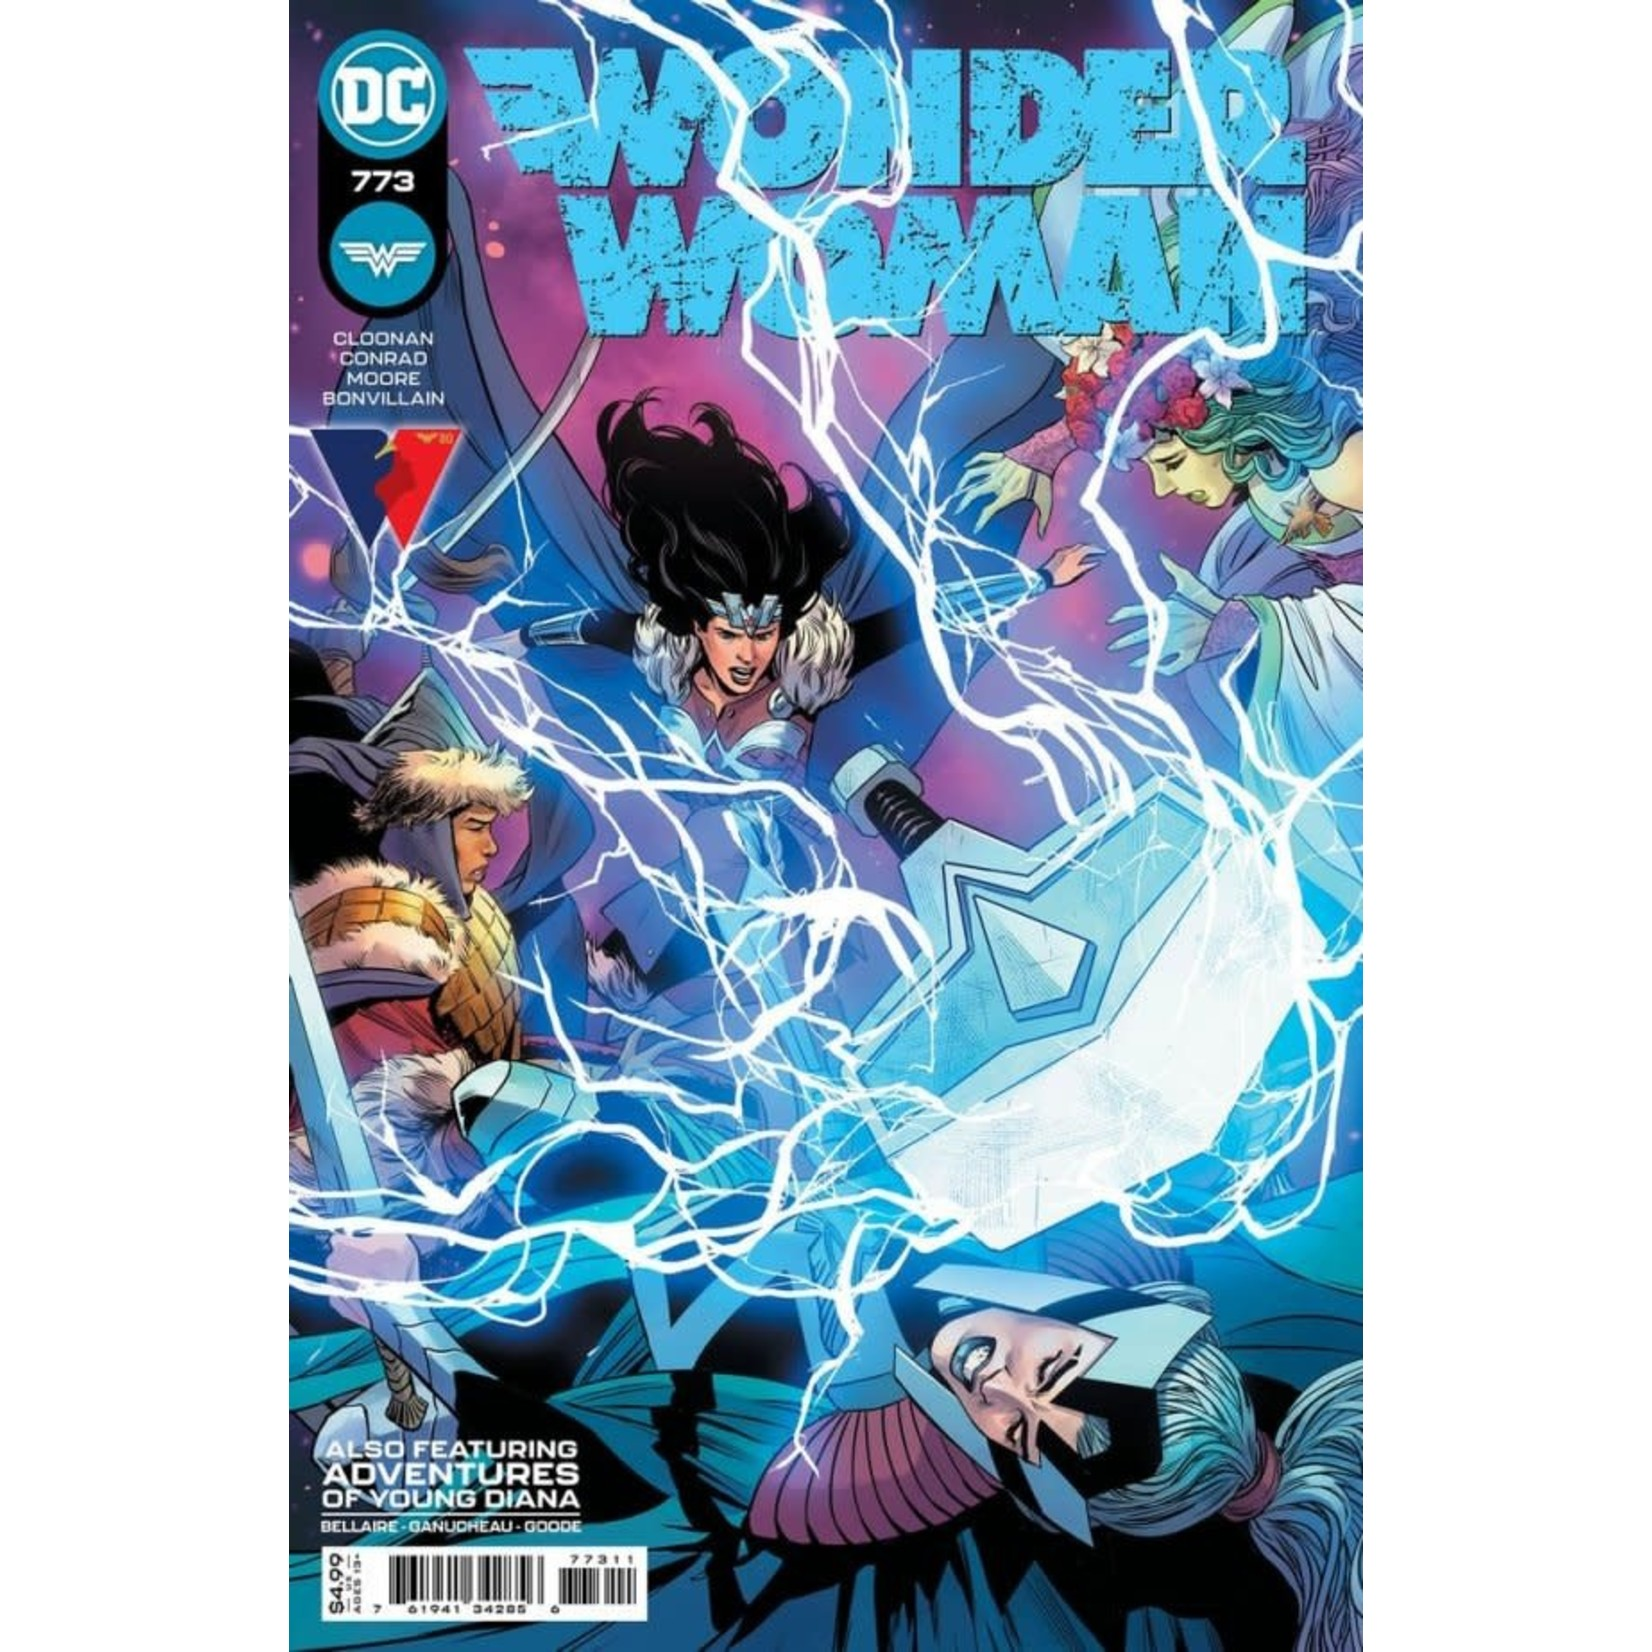 DC Comics WONDER WOMAN #773 CVR A TRAVIS MOORE